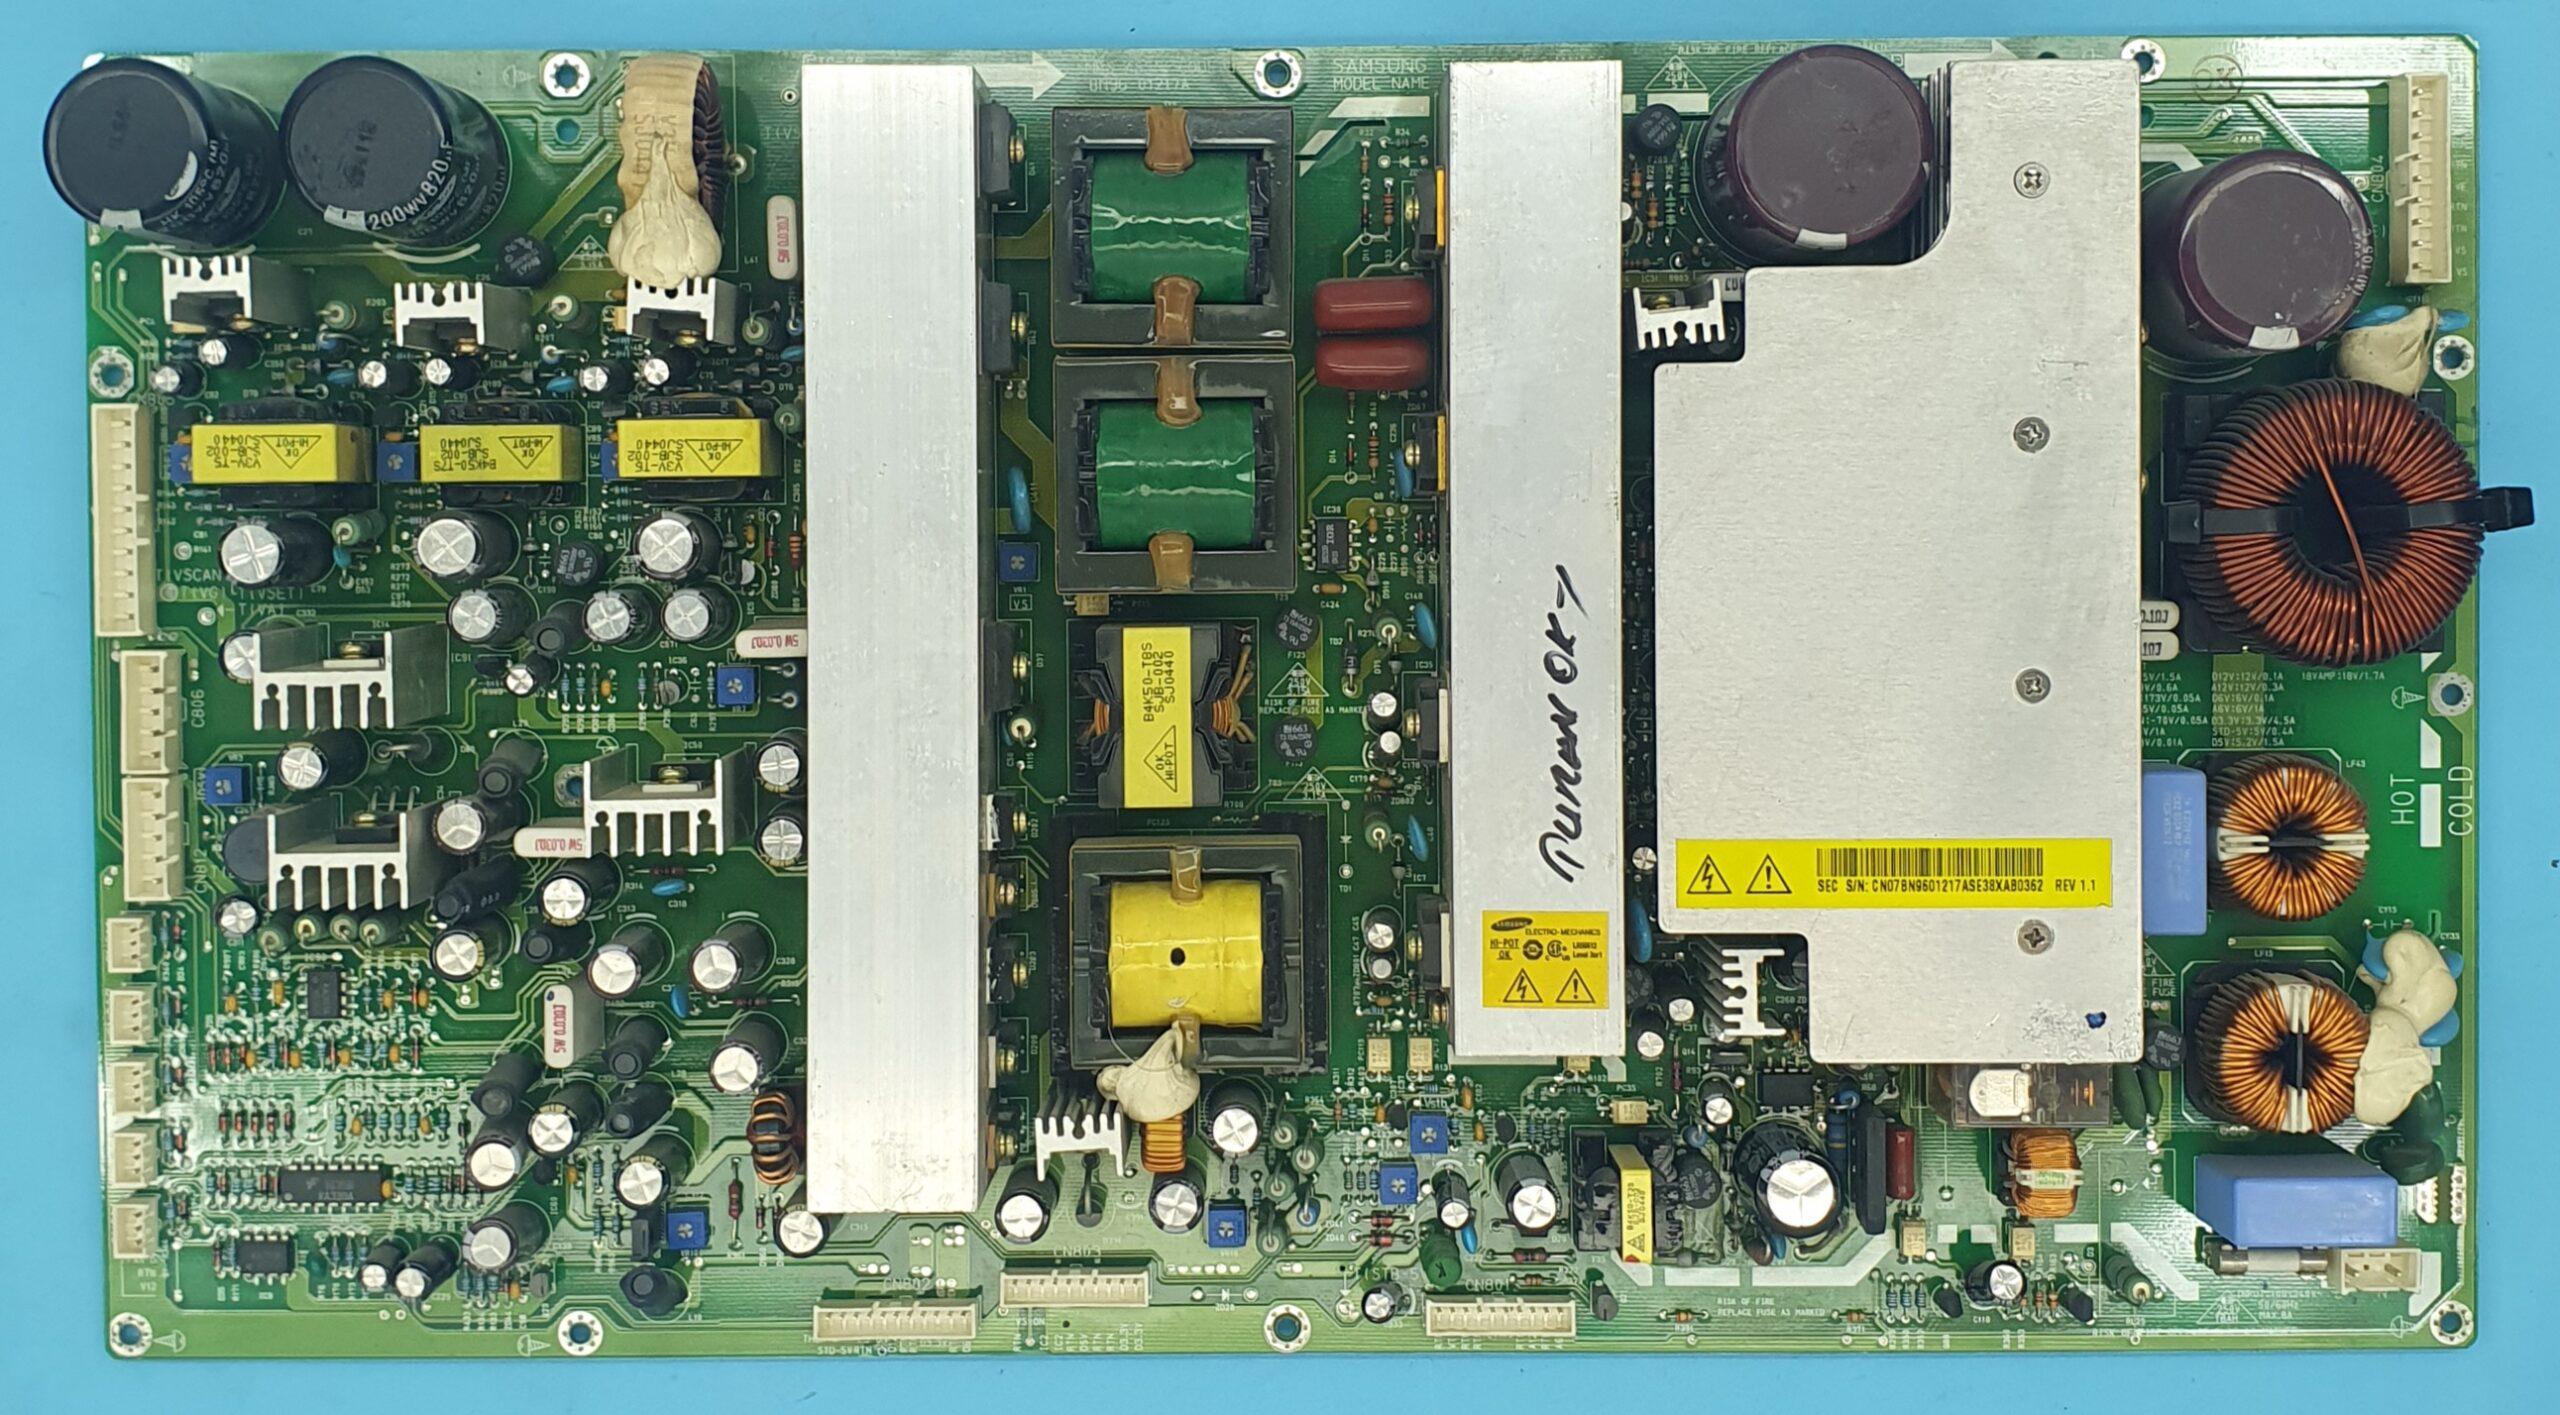 BN96-01217A Samsung Anakart (KDV DAHİL = 180 TL)